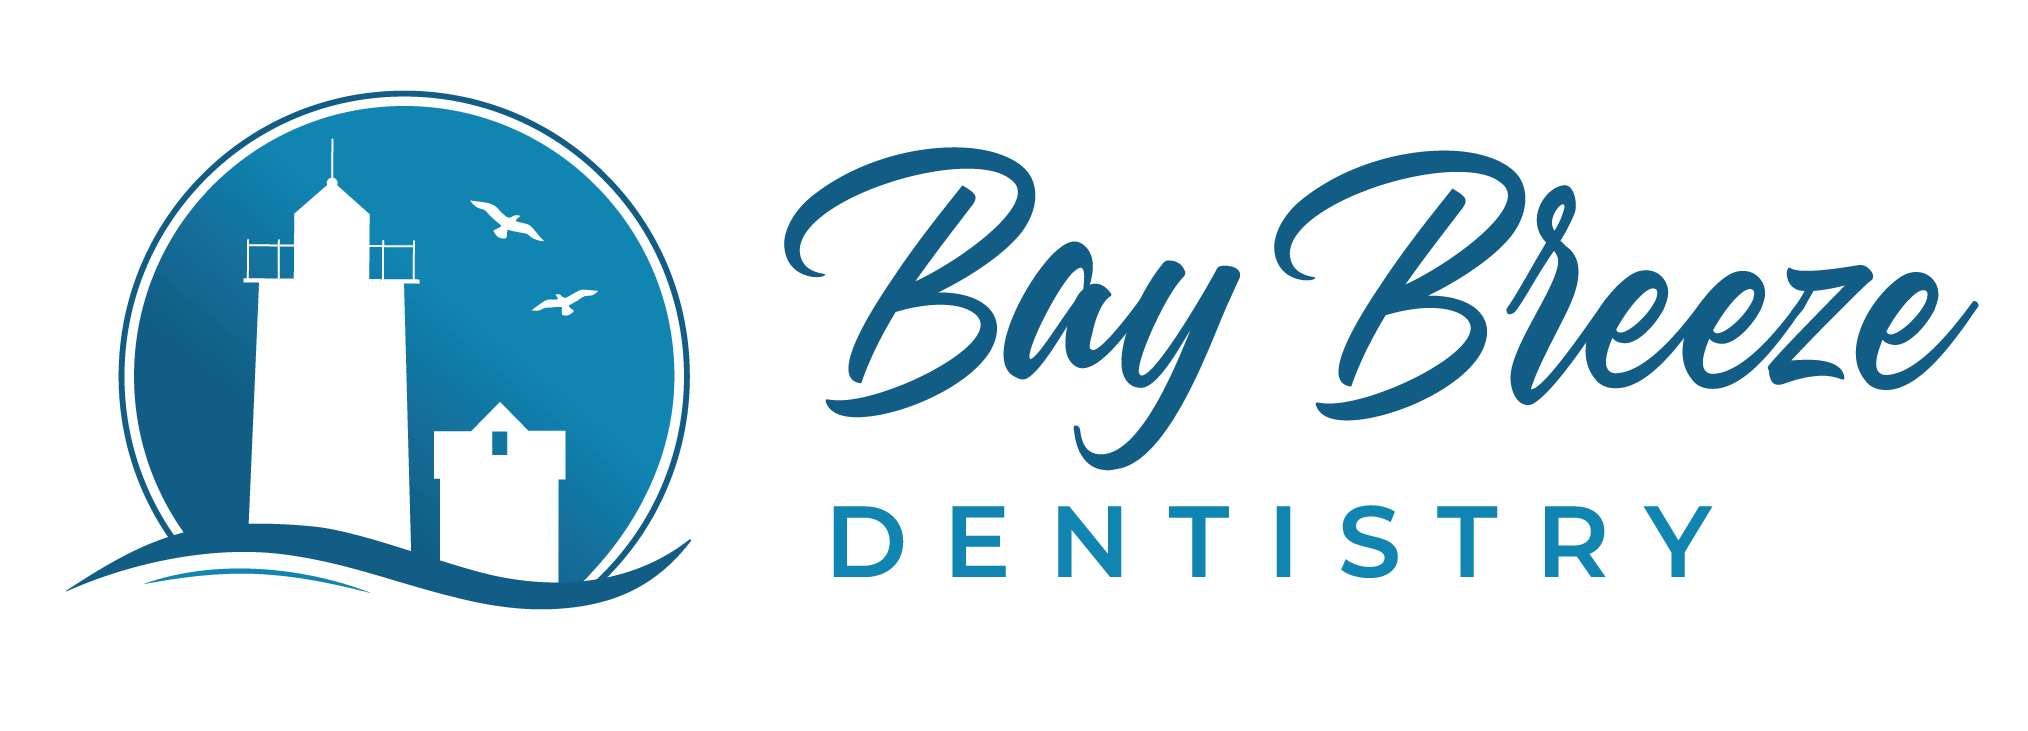 Portsmouth, NH Dentist Bay Breeze Dentistry Mobile Logo